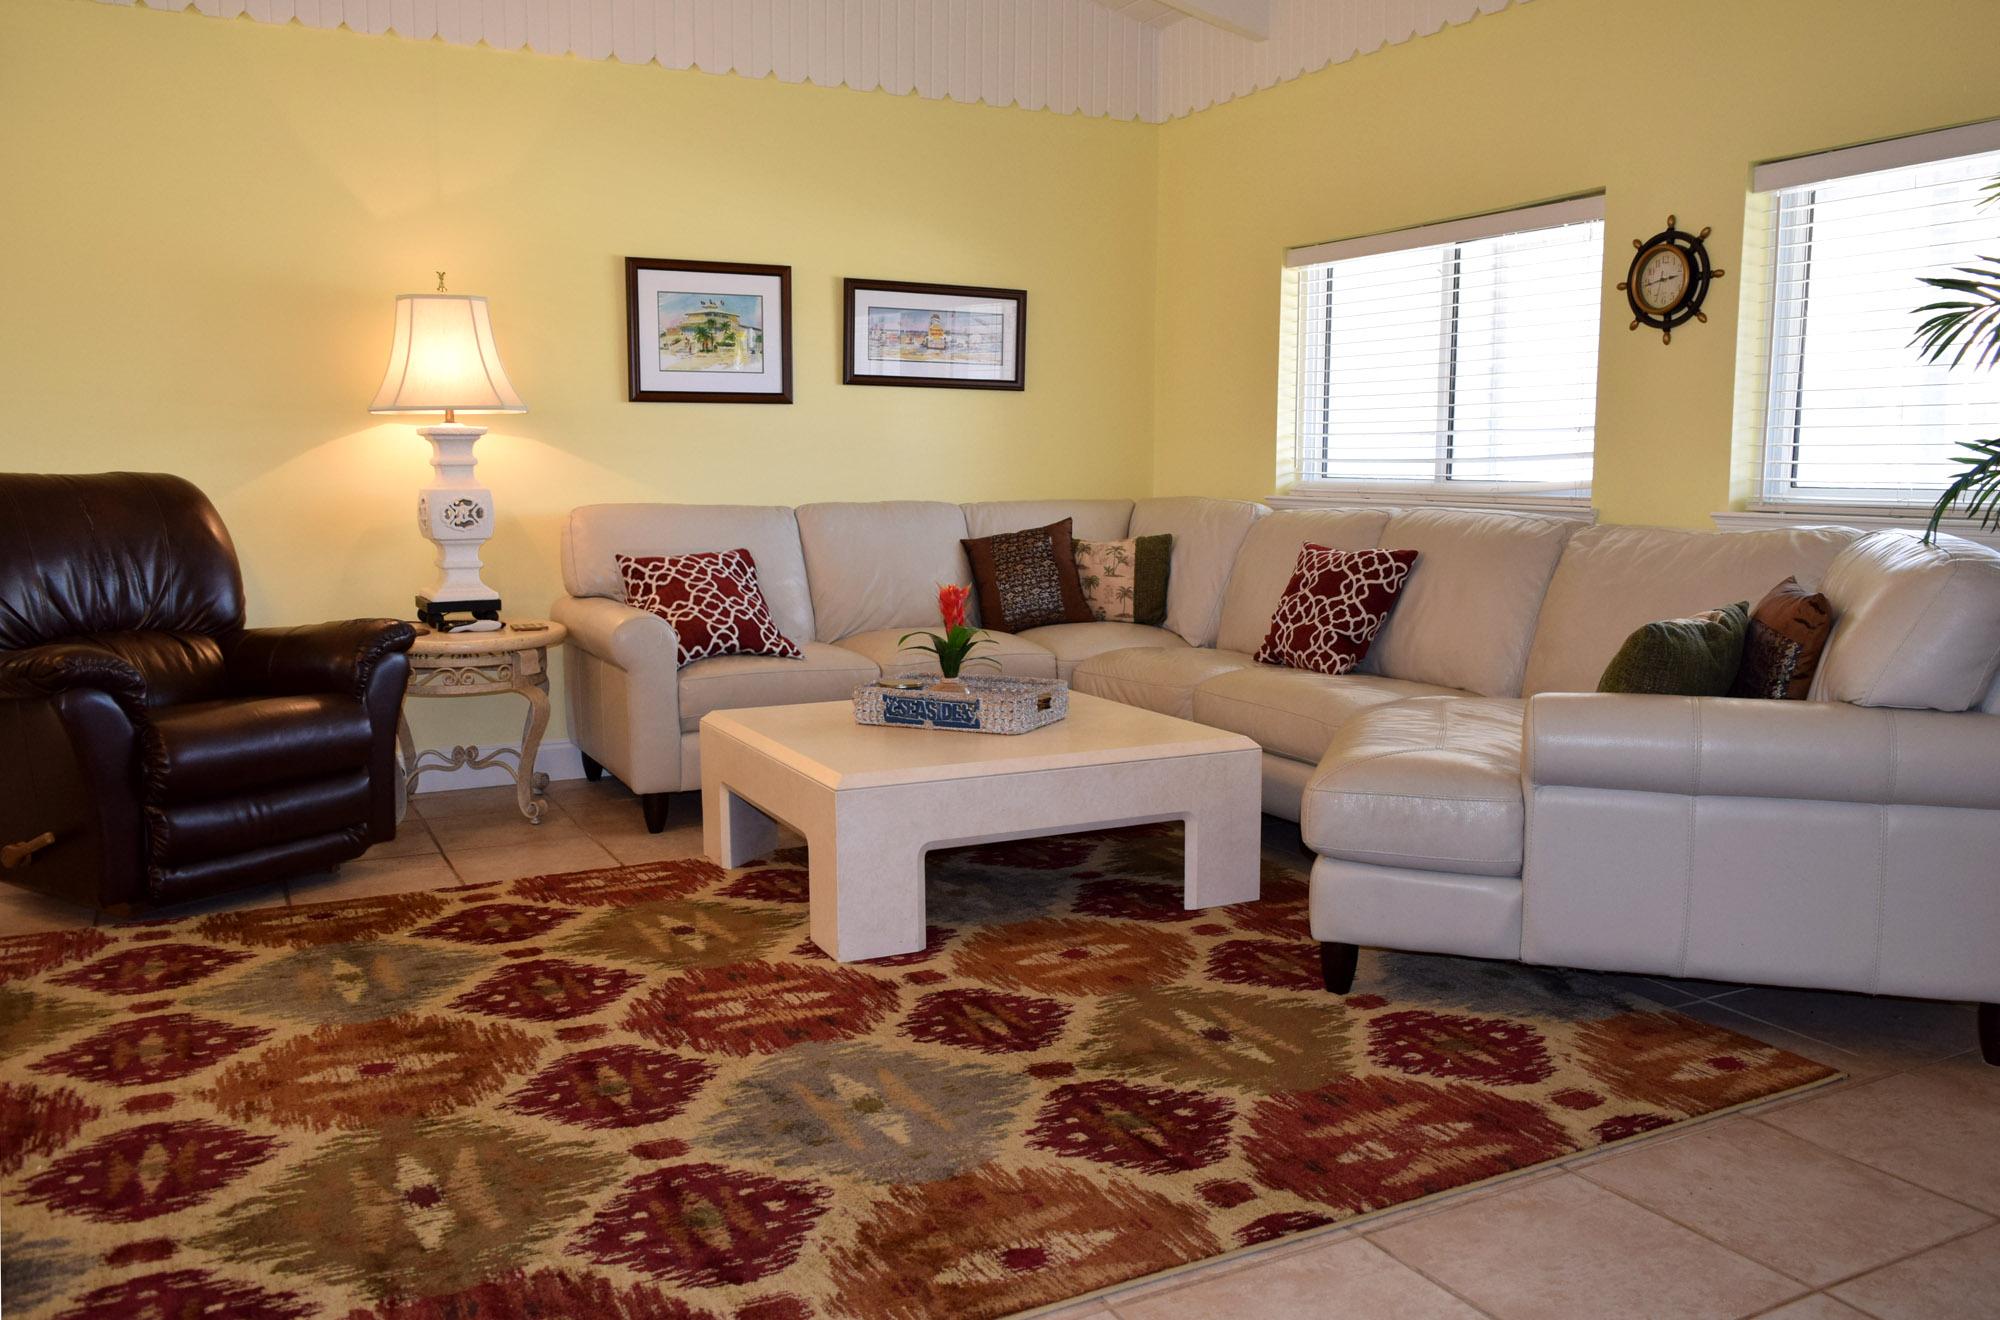 Maldonado 303 House/Cottage rental in Pensacola Beach House Rentals in Pensacola Beach Florida - #2